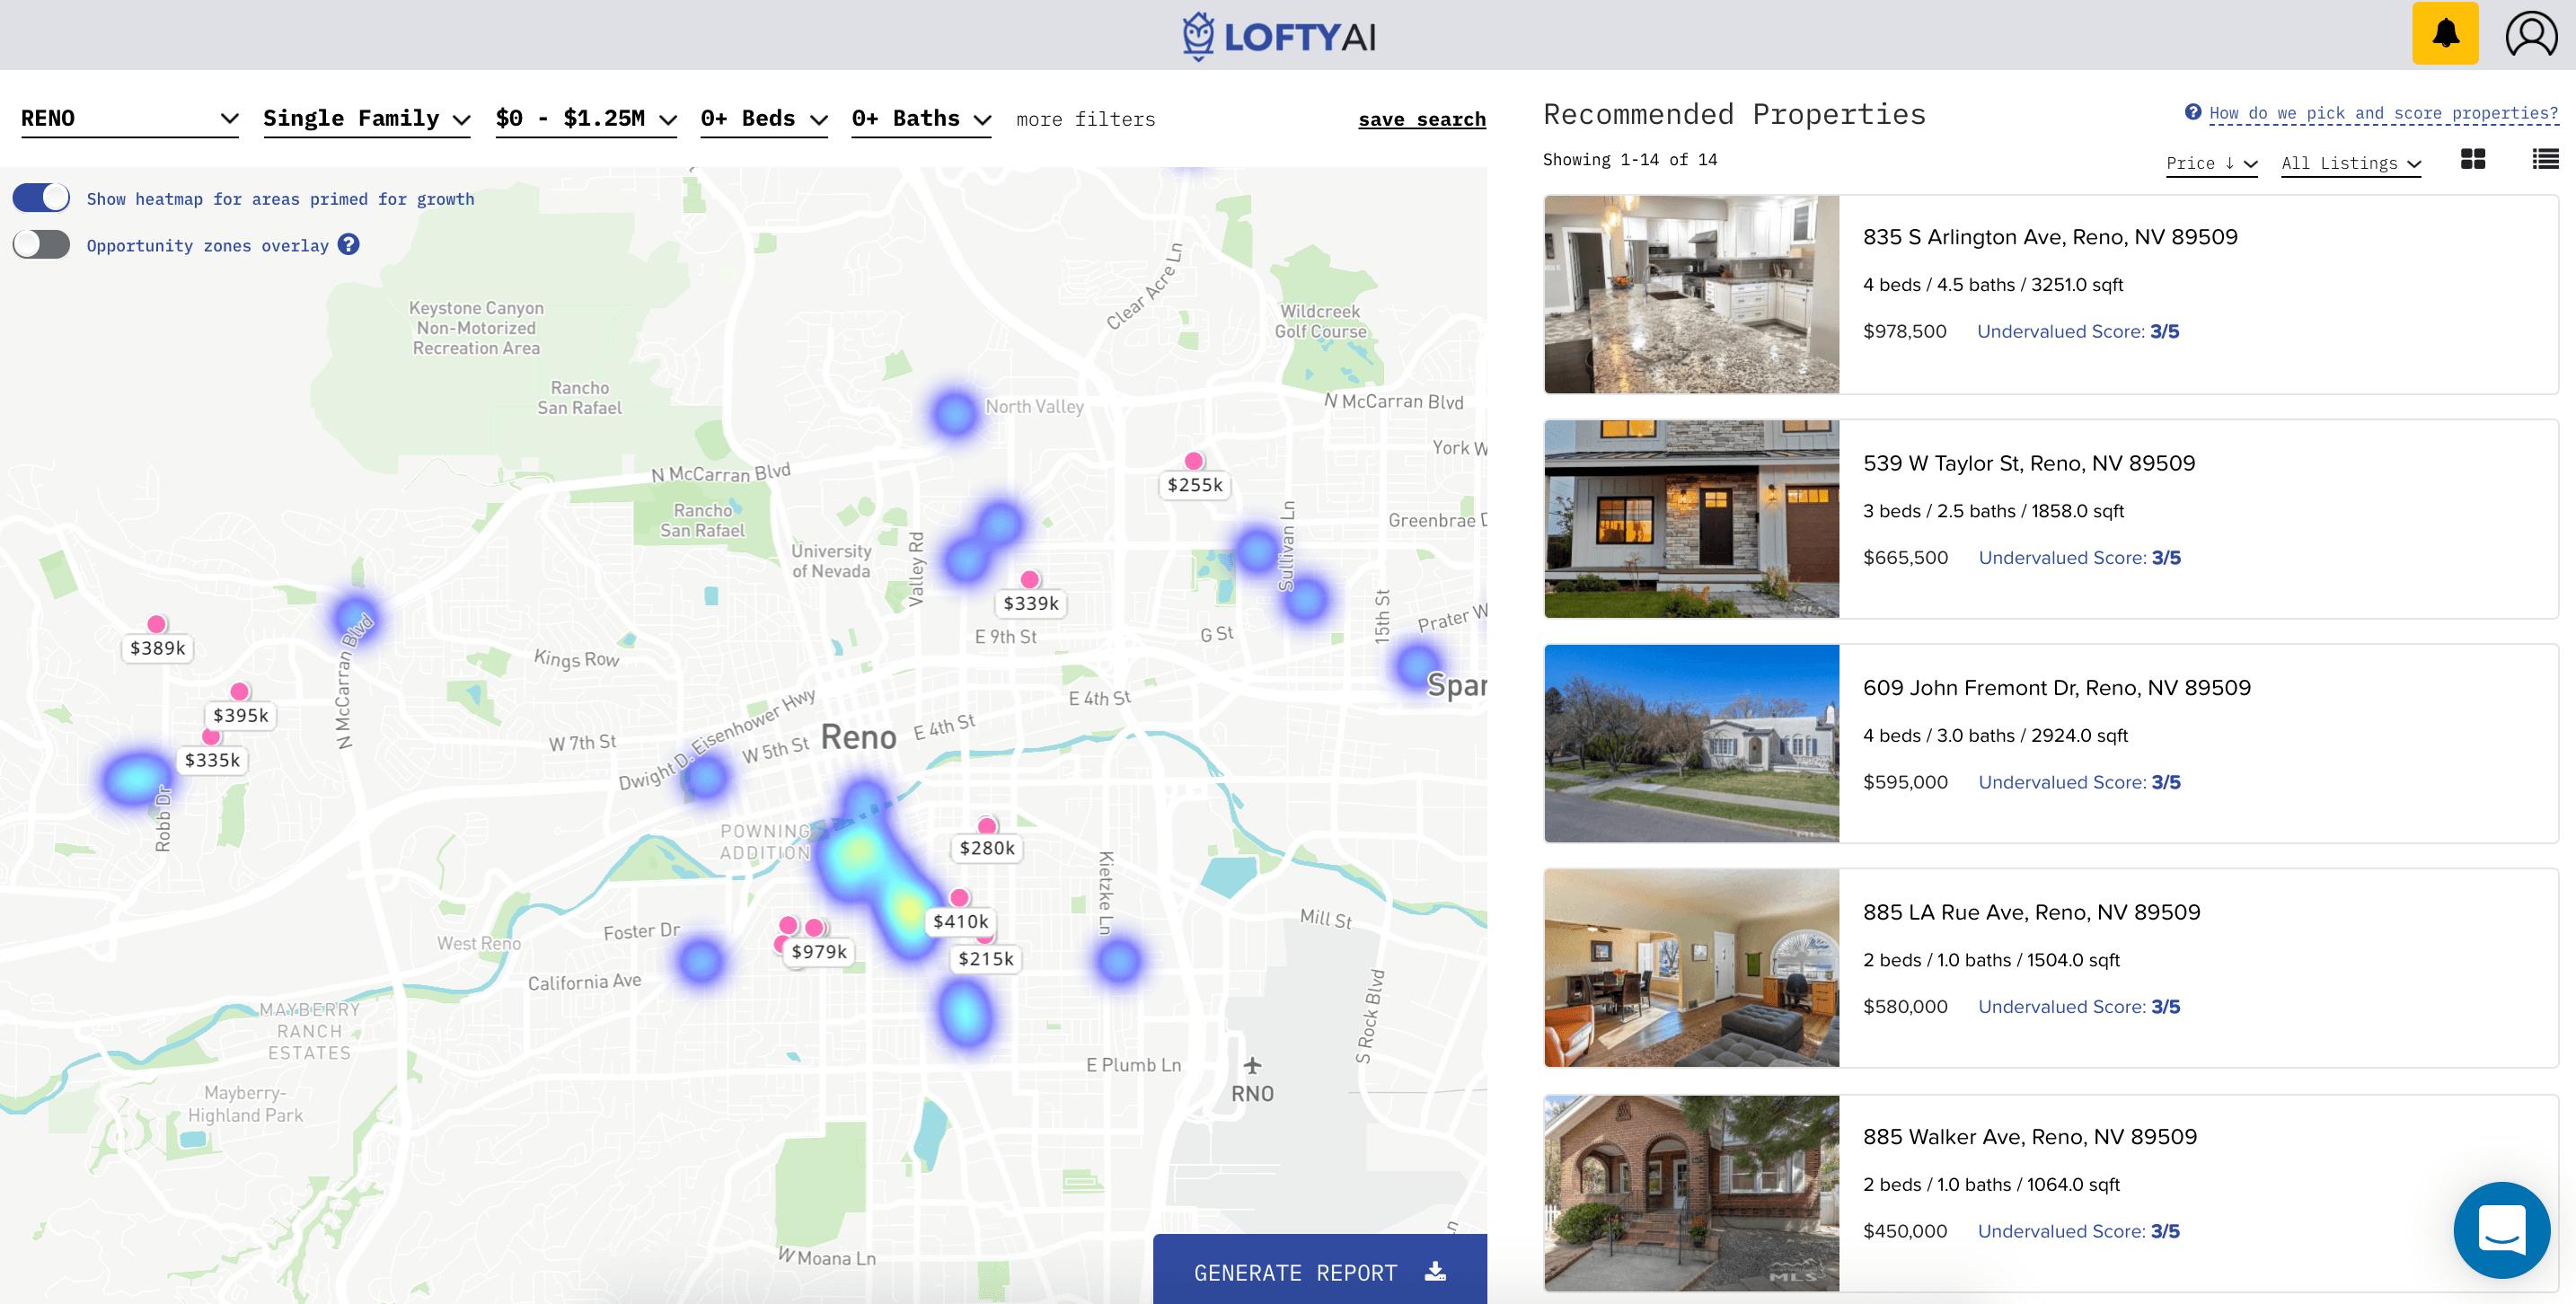 Lofty AI real estate investing app in Reno, Nevada